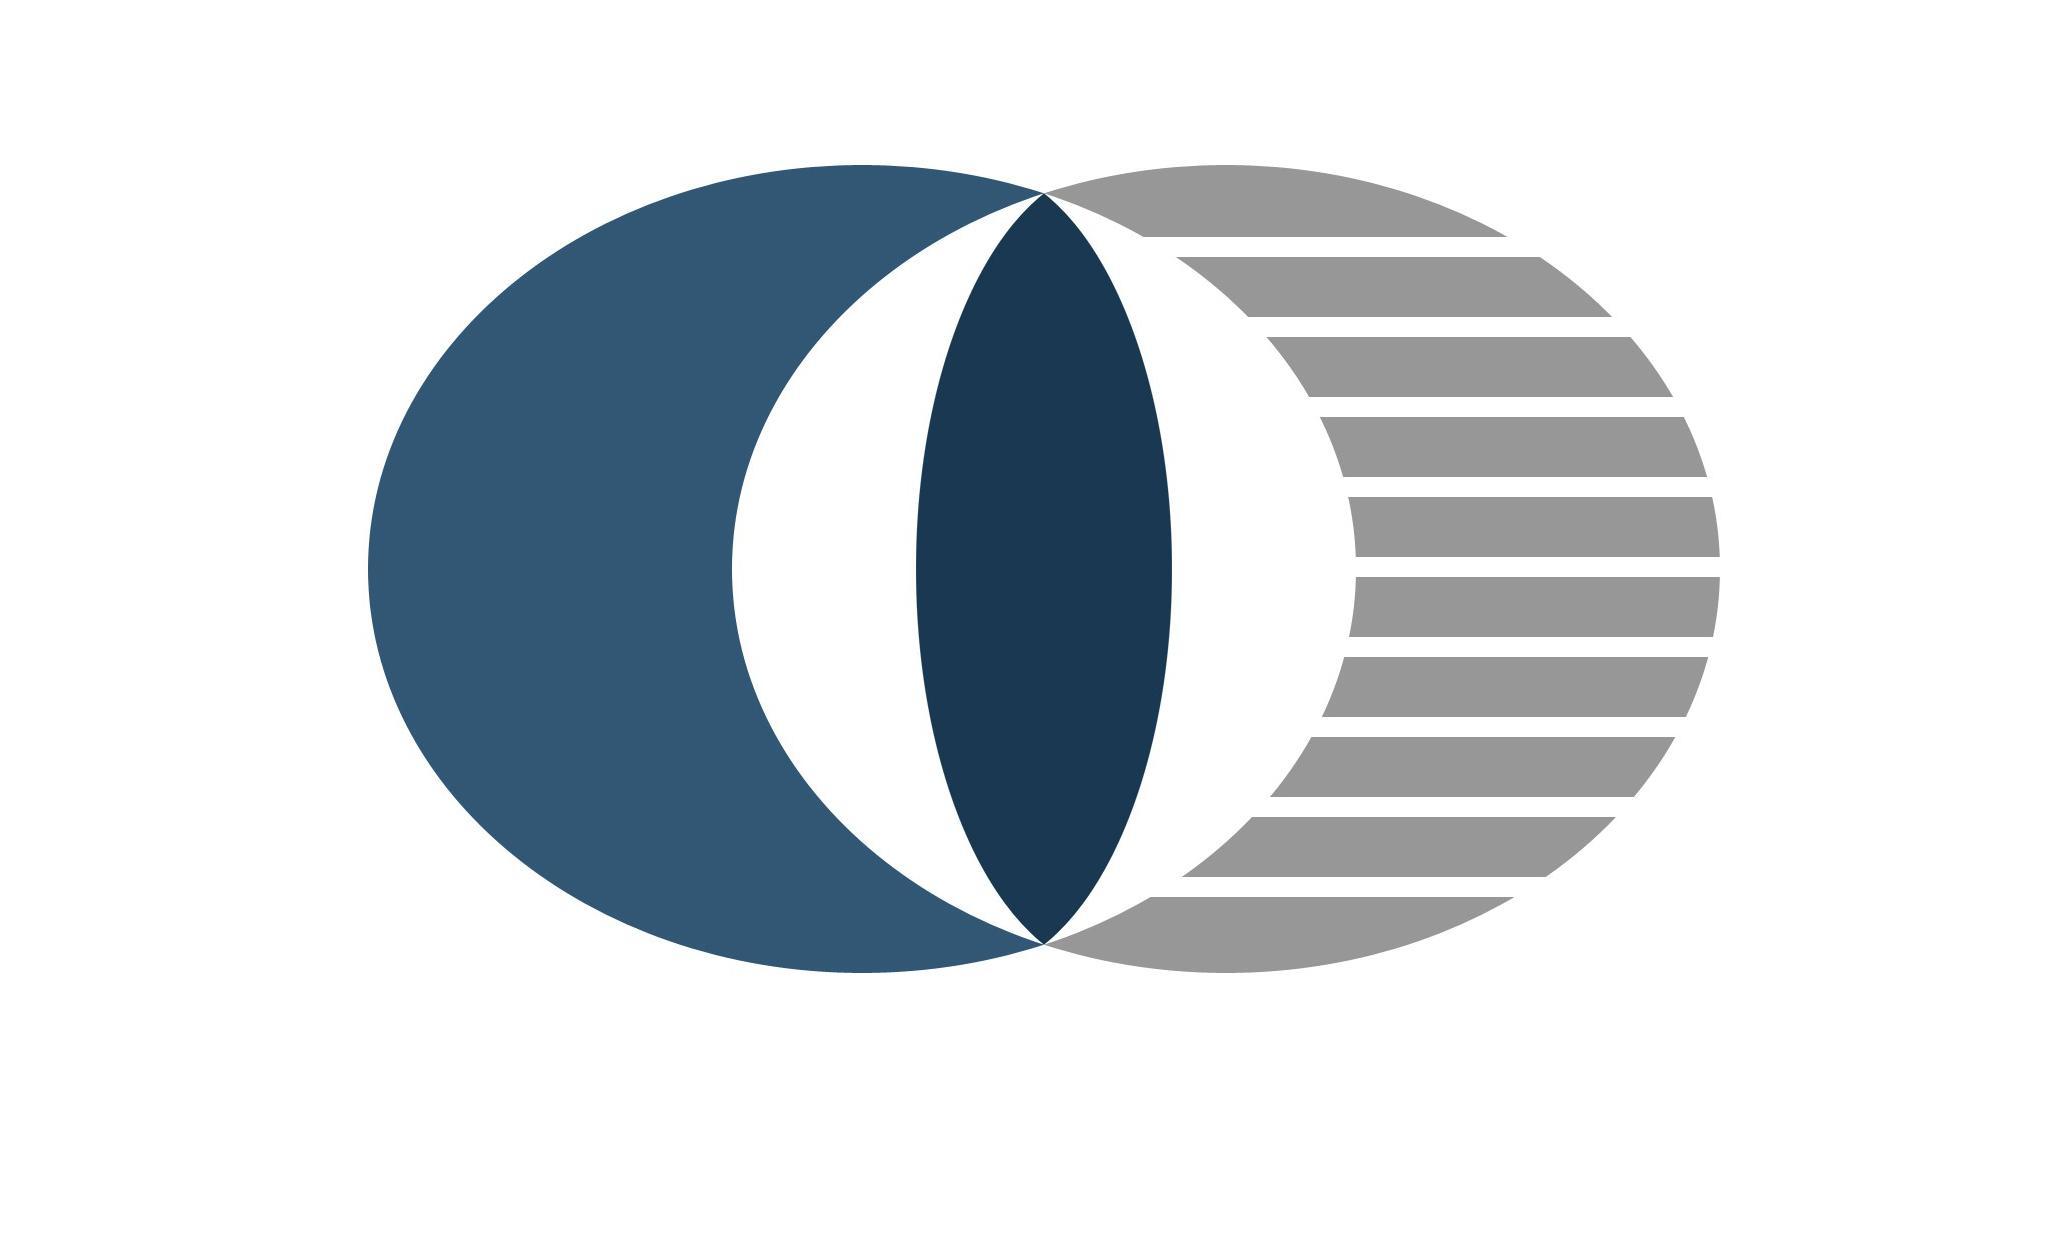 OPERACIONES INTEGRADAS SA DE CV